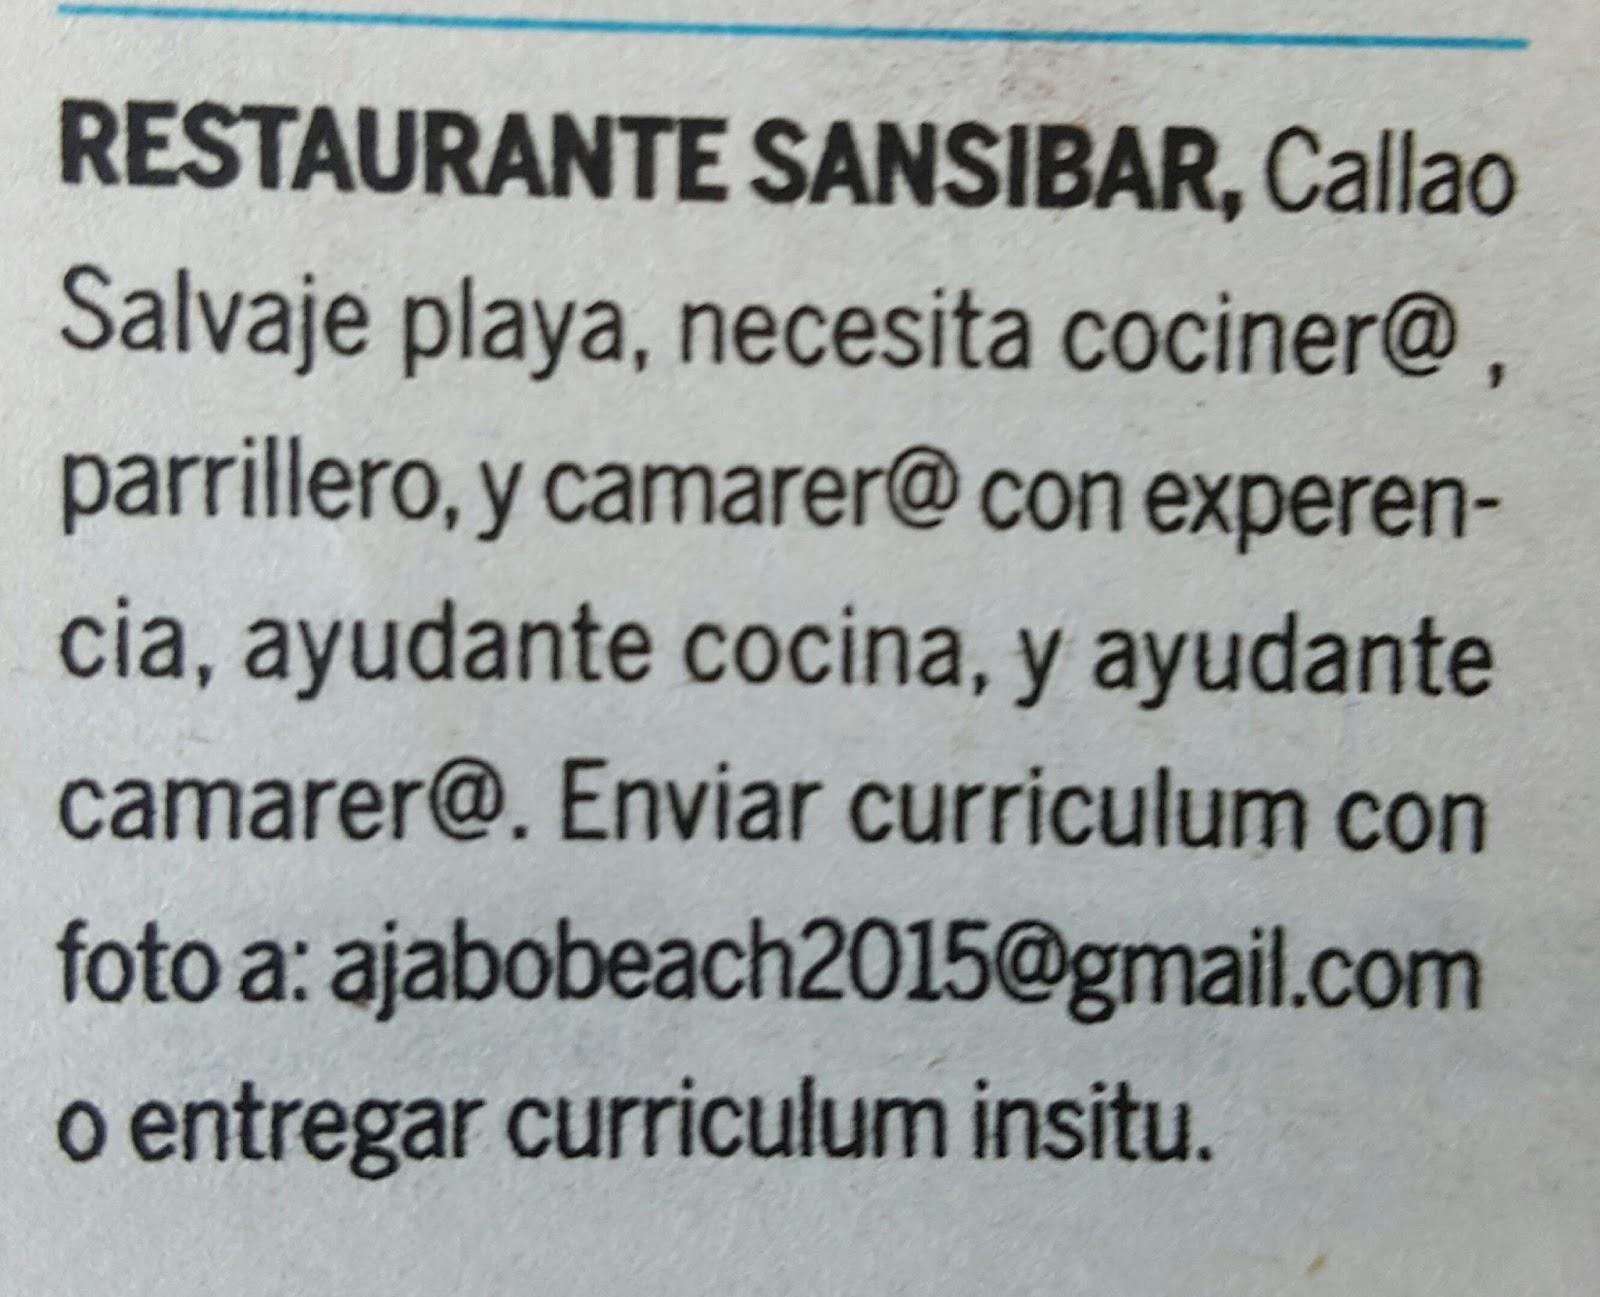 FPEmpleo: Oferta empleos en Callao Salvaje playa, TenerifeSur